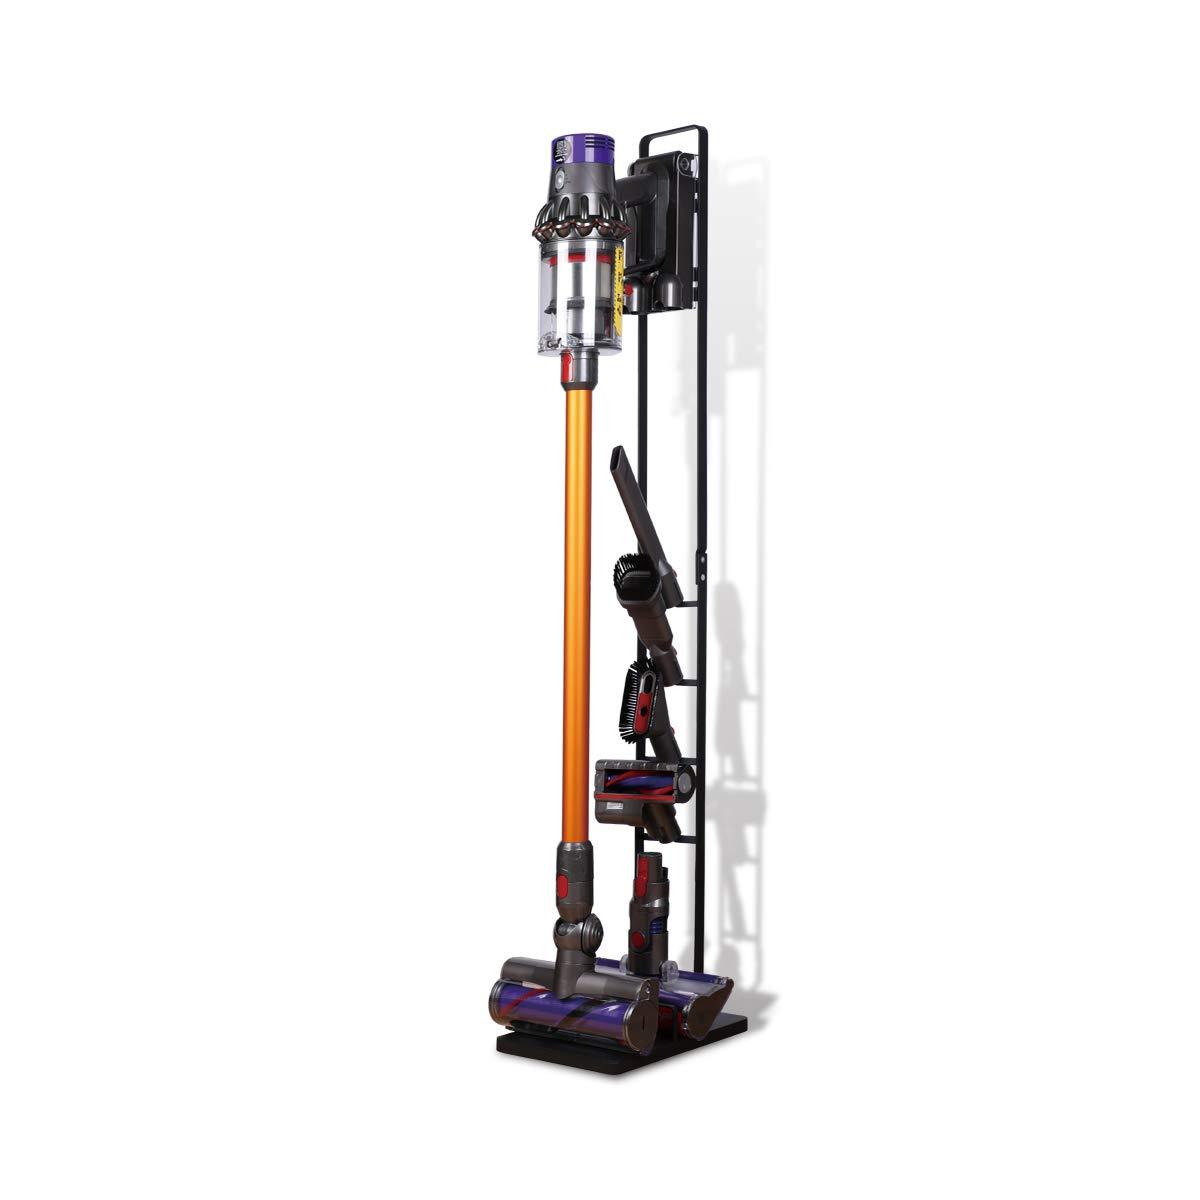 LANMU Docking Station Accessory Holder Stand for Dyson V11 V10 V8 V7 V6 Vacuum Cleaner, Attachment Storage, No More Messy Tools (Black) by LANMU